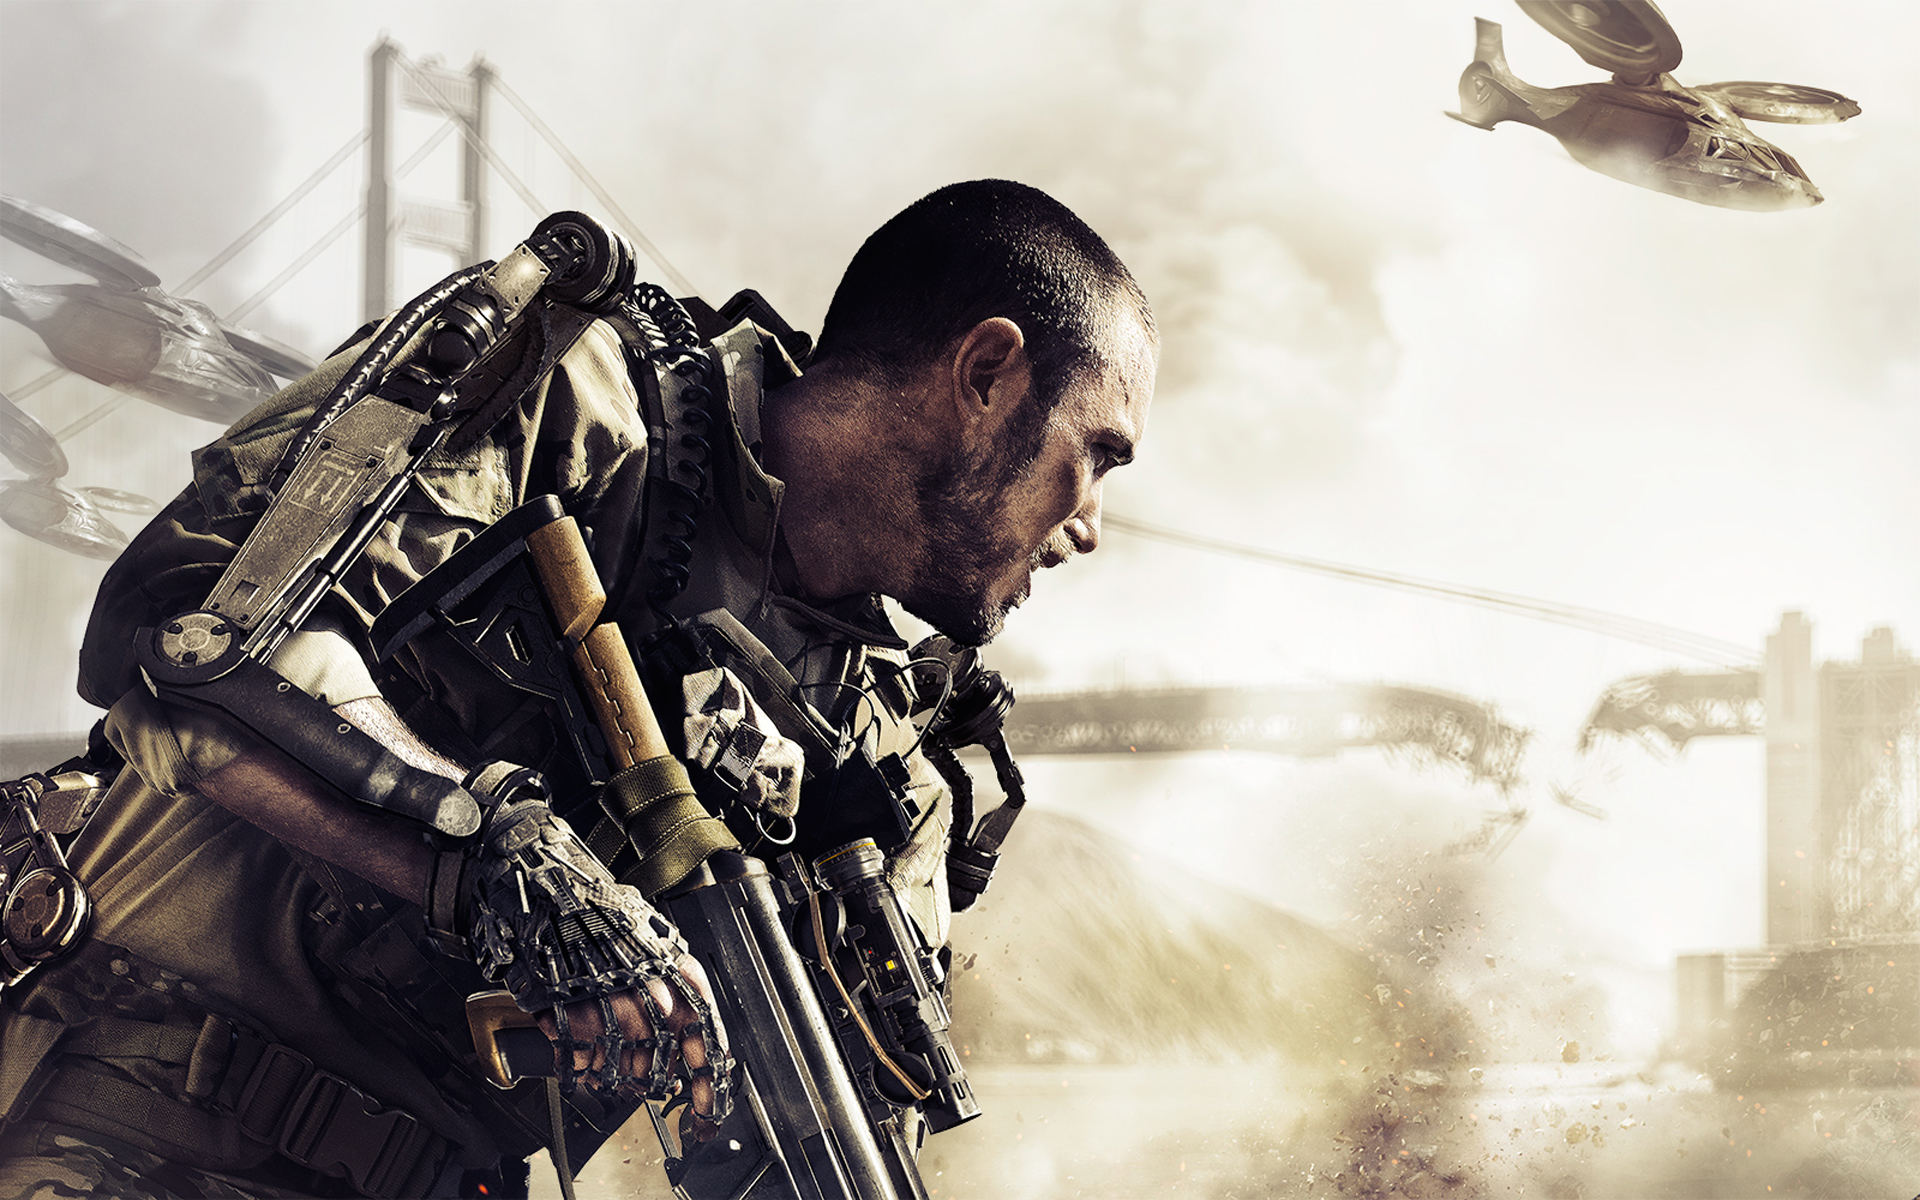 Call Of Duty Advanced Warfare Game HD Wallpapers 1920x1200